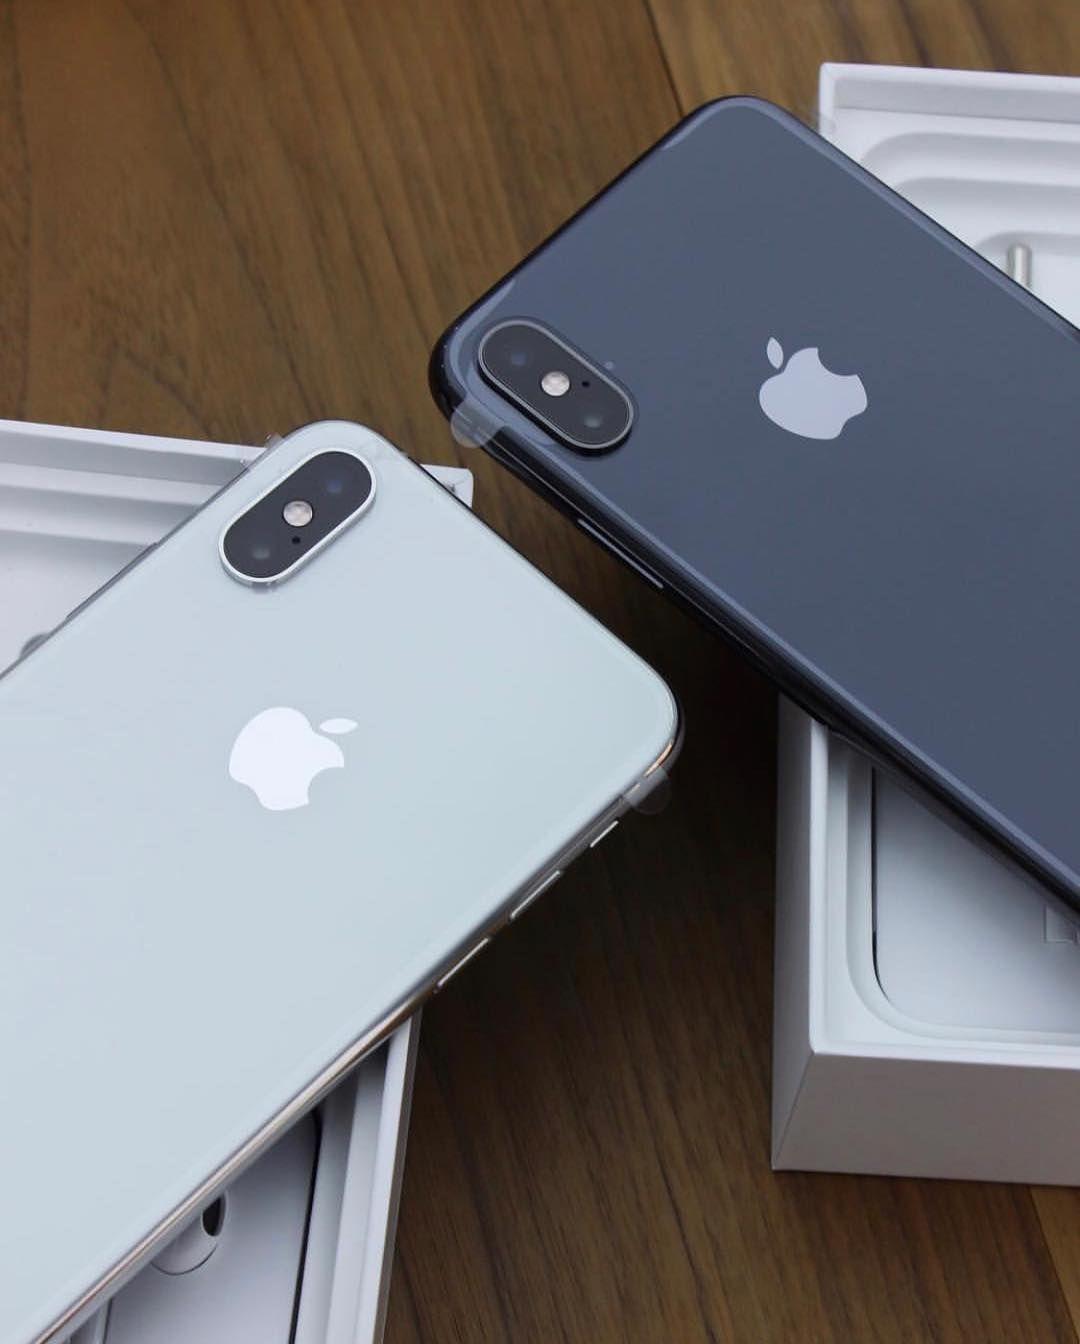 Apple Iphone 11 Apple Watch Airpods Steve Jobs Tim Cook Smartphone Ipad Iphone Apple Products Smartphone